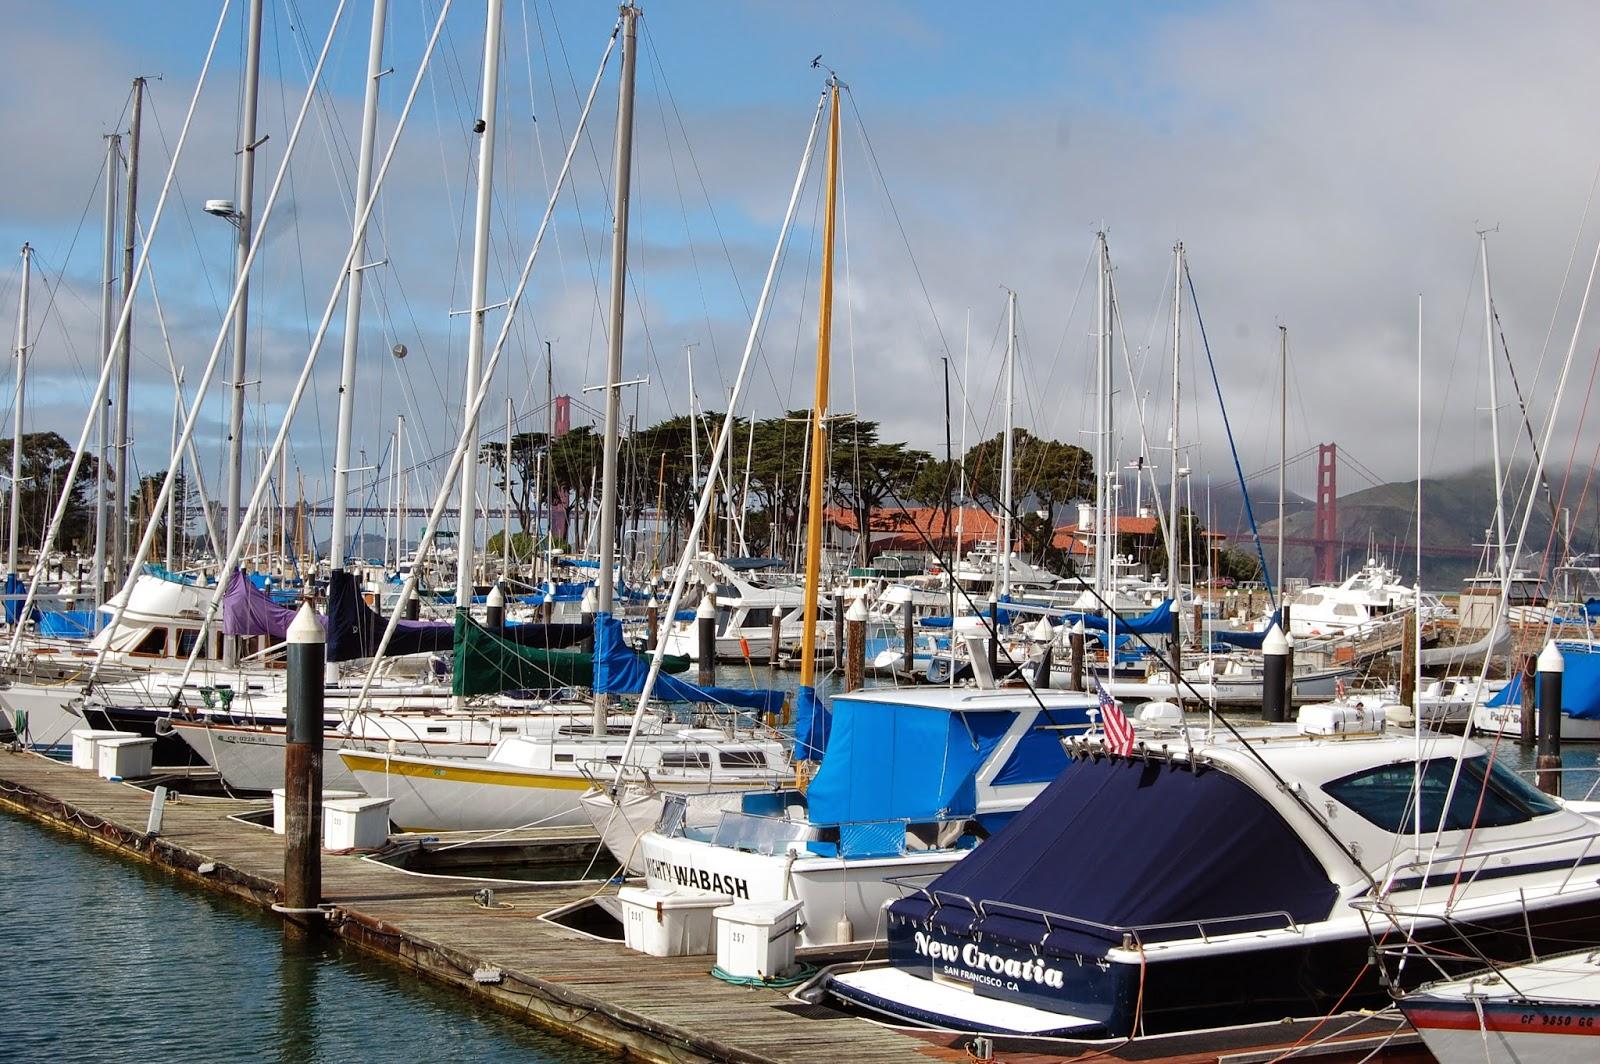 Marina de San Francisco, près du Golden Gate Bridge